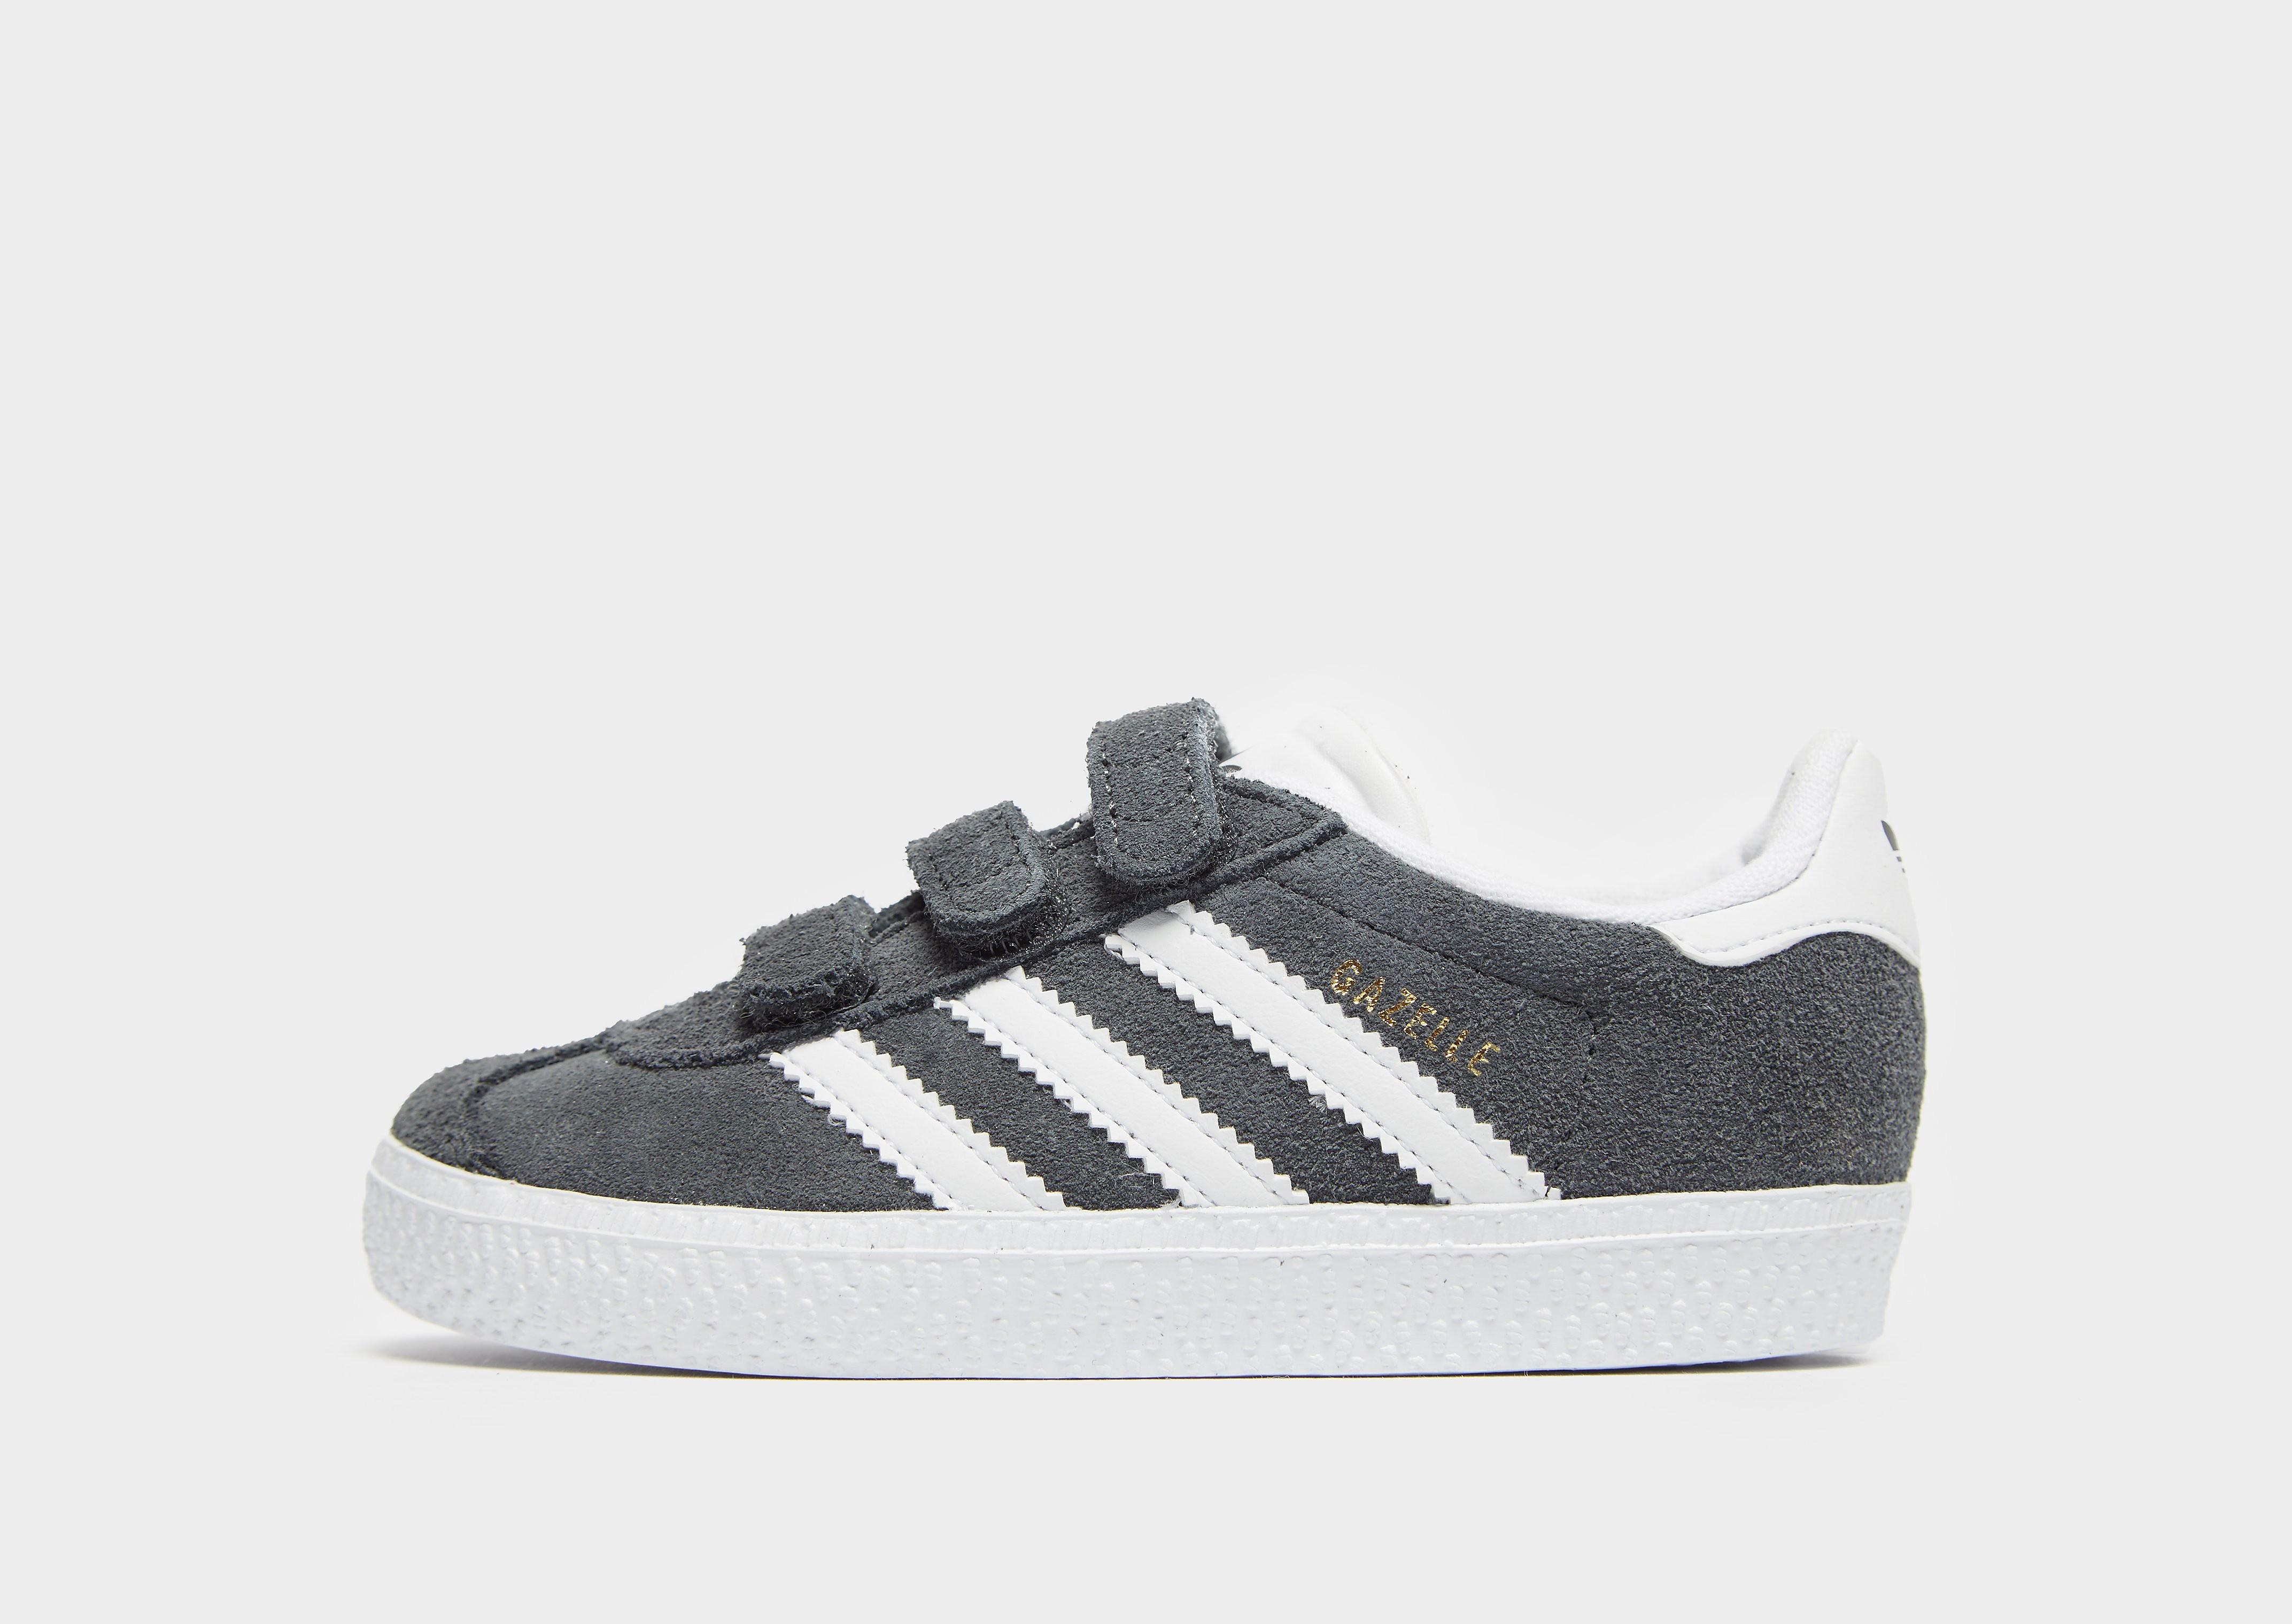 Adidas Gazelle kindersneaker grijs